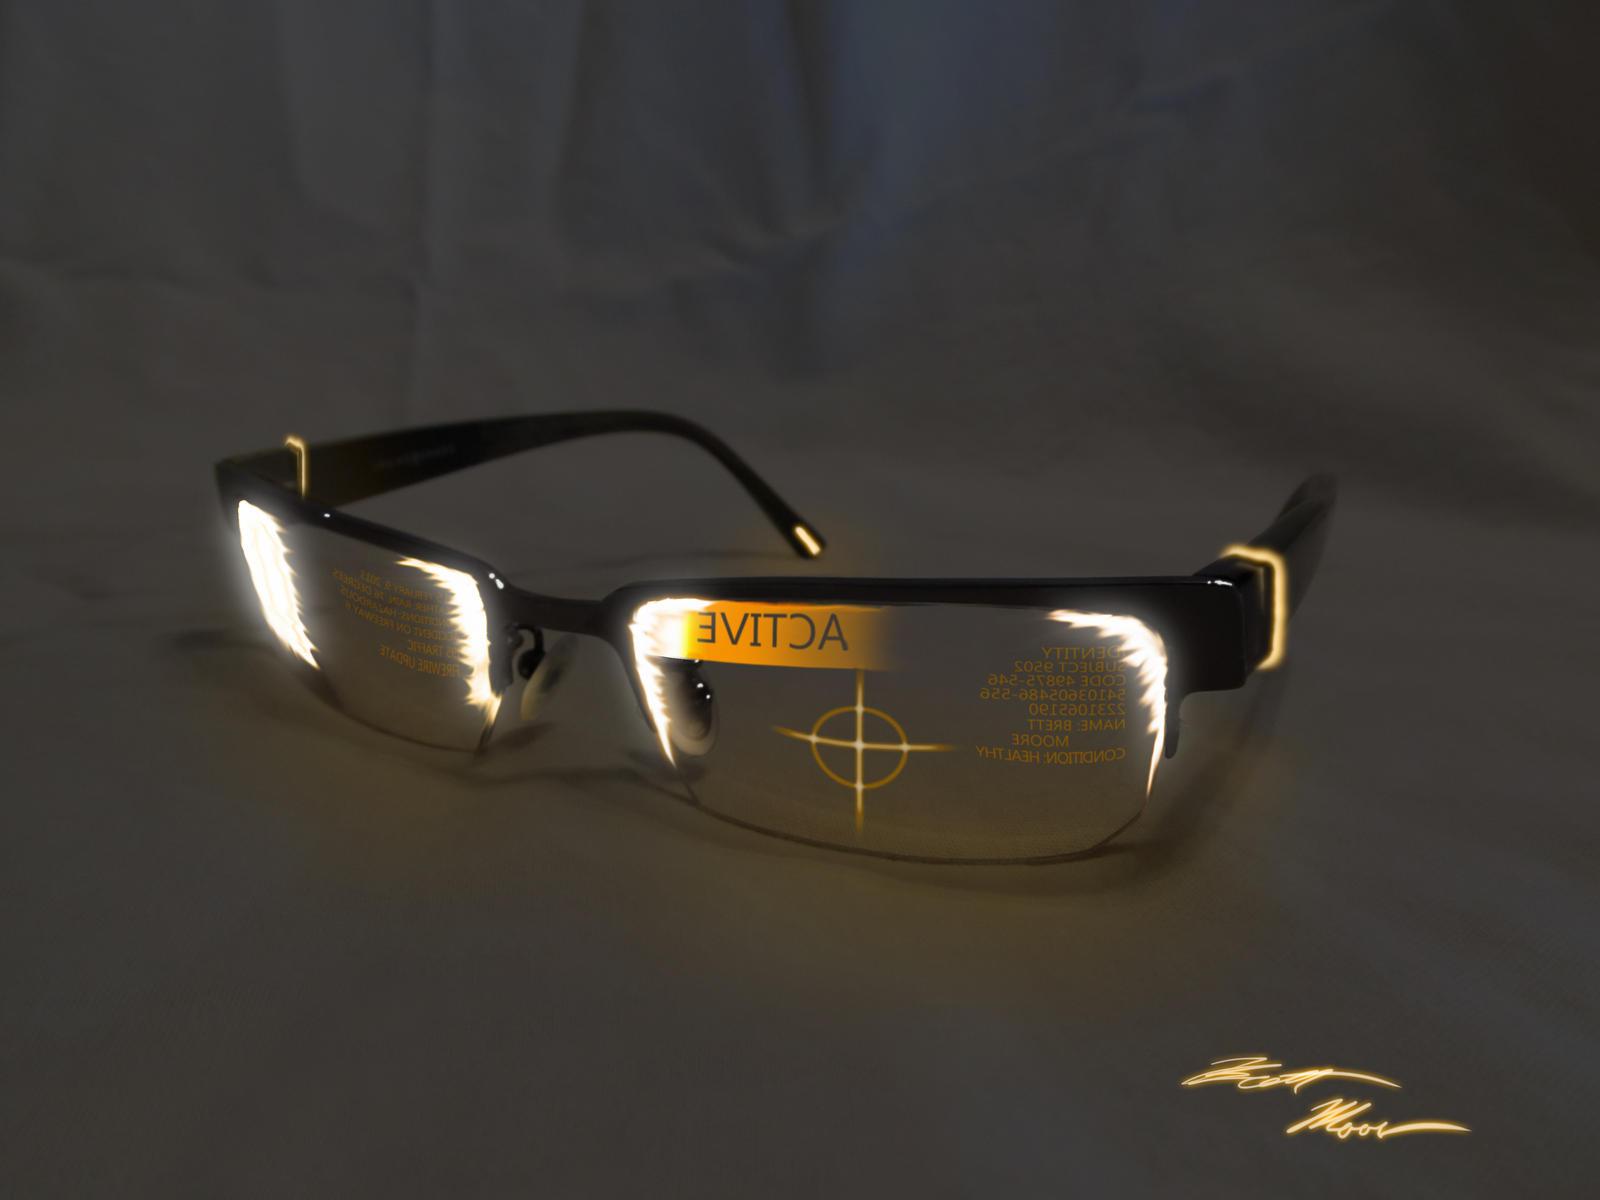 glasses hud by dioxim on deviantart